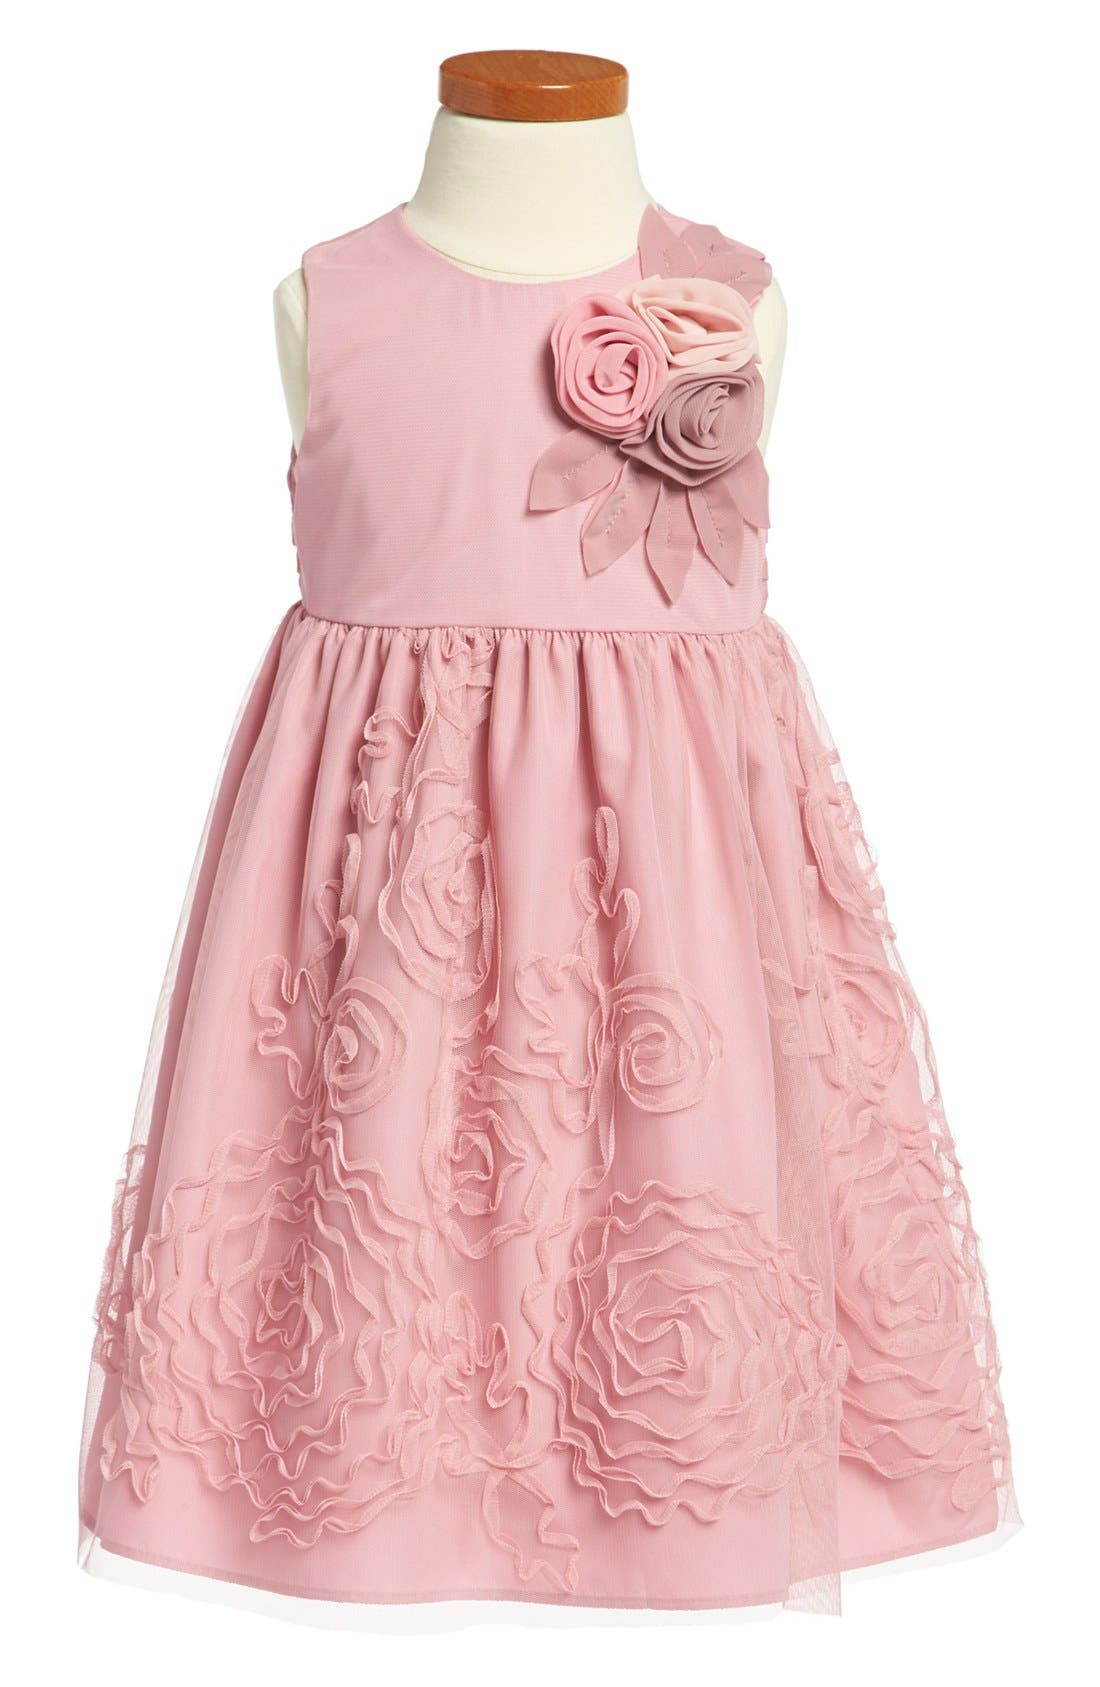 Alternate Image 1 Selected - Pippa & Julie Sleeveless Dress (Toddler Girls)